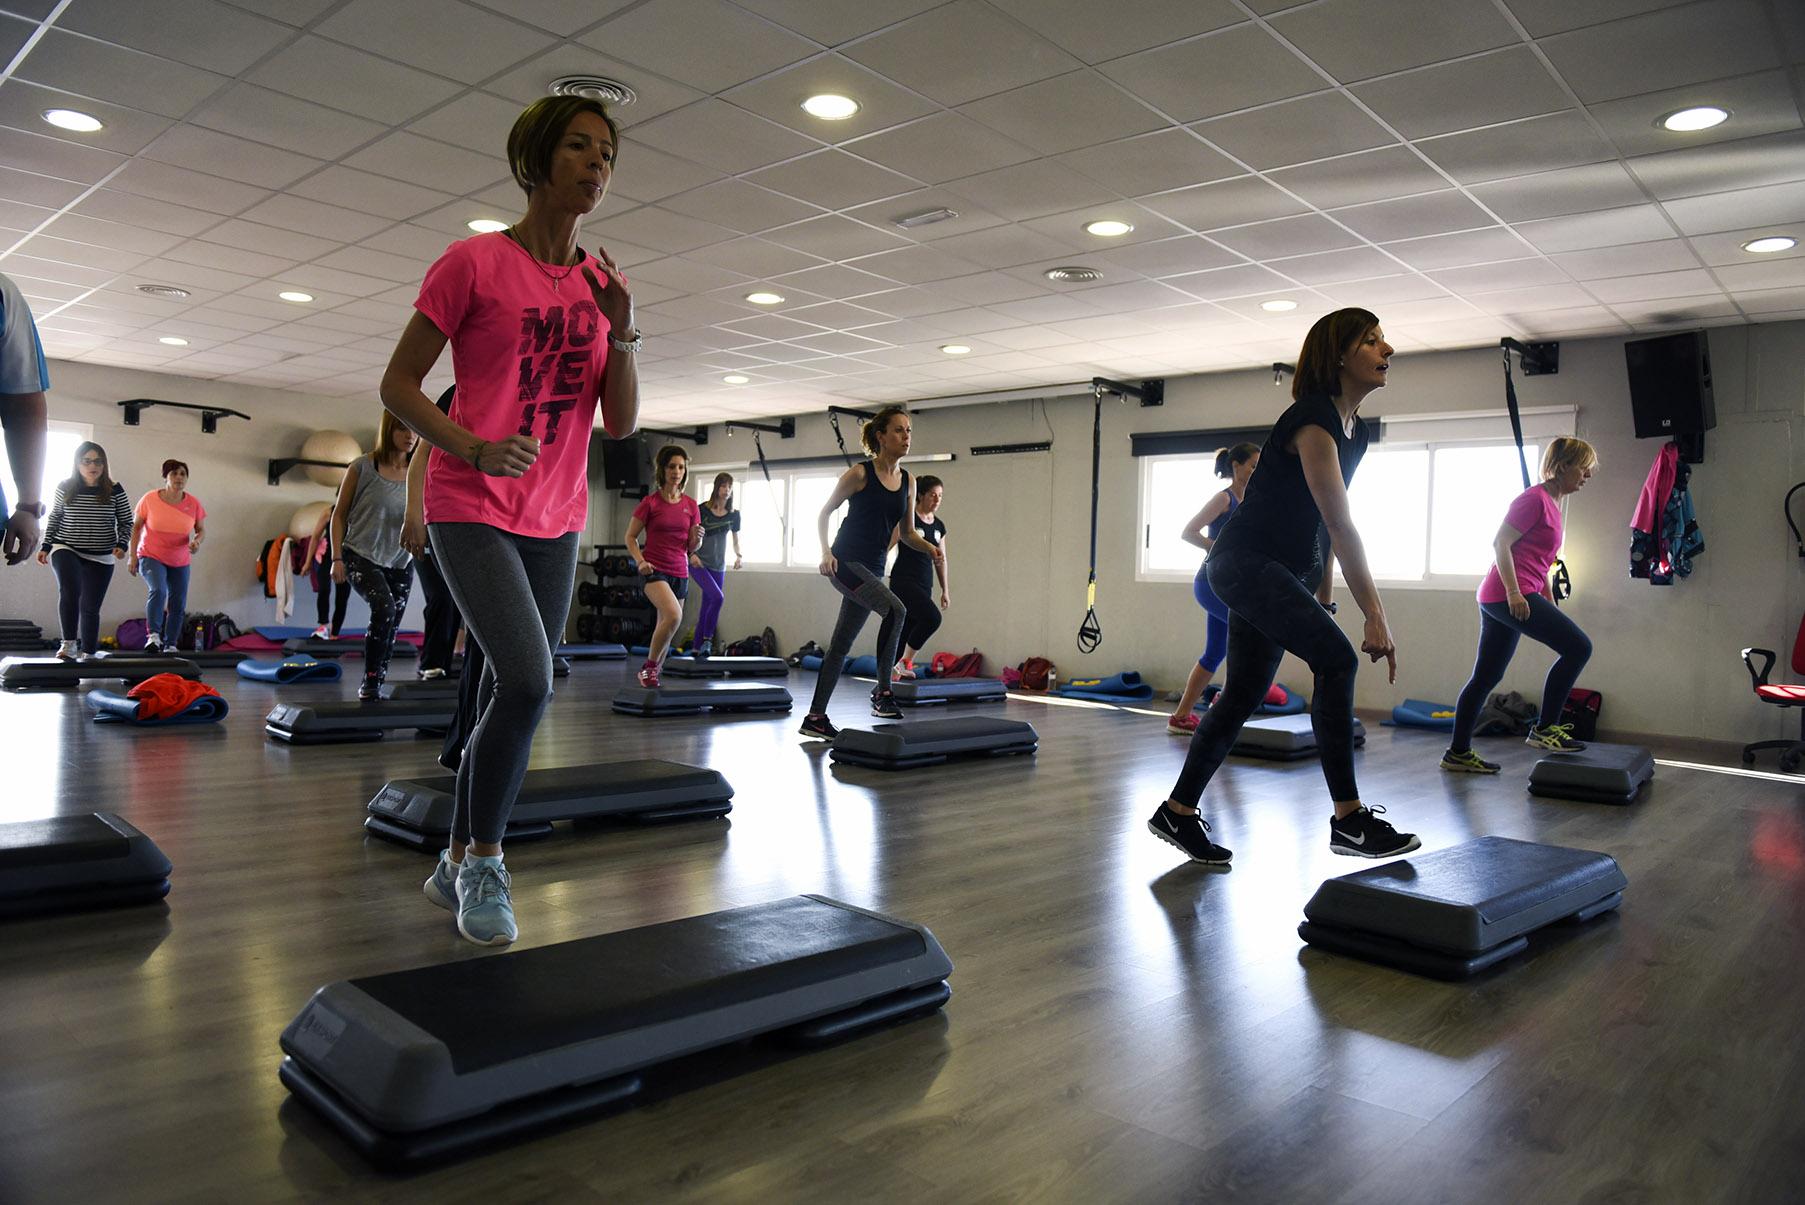 ofertas fitness verano indoor huesca